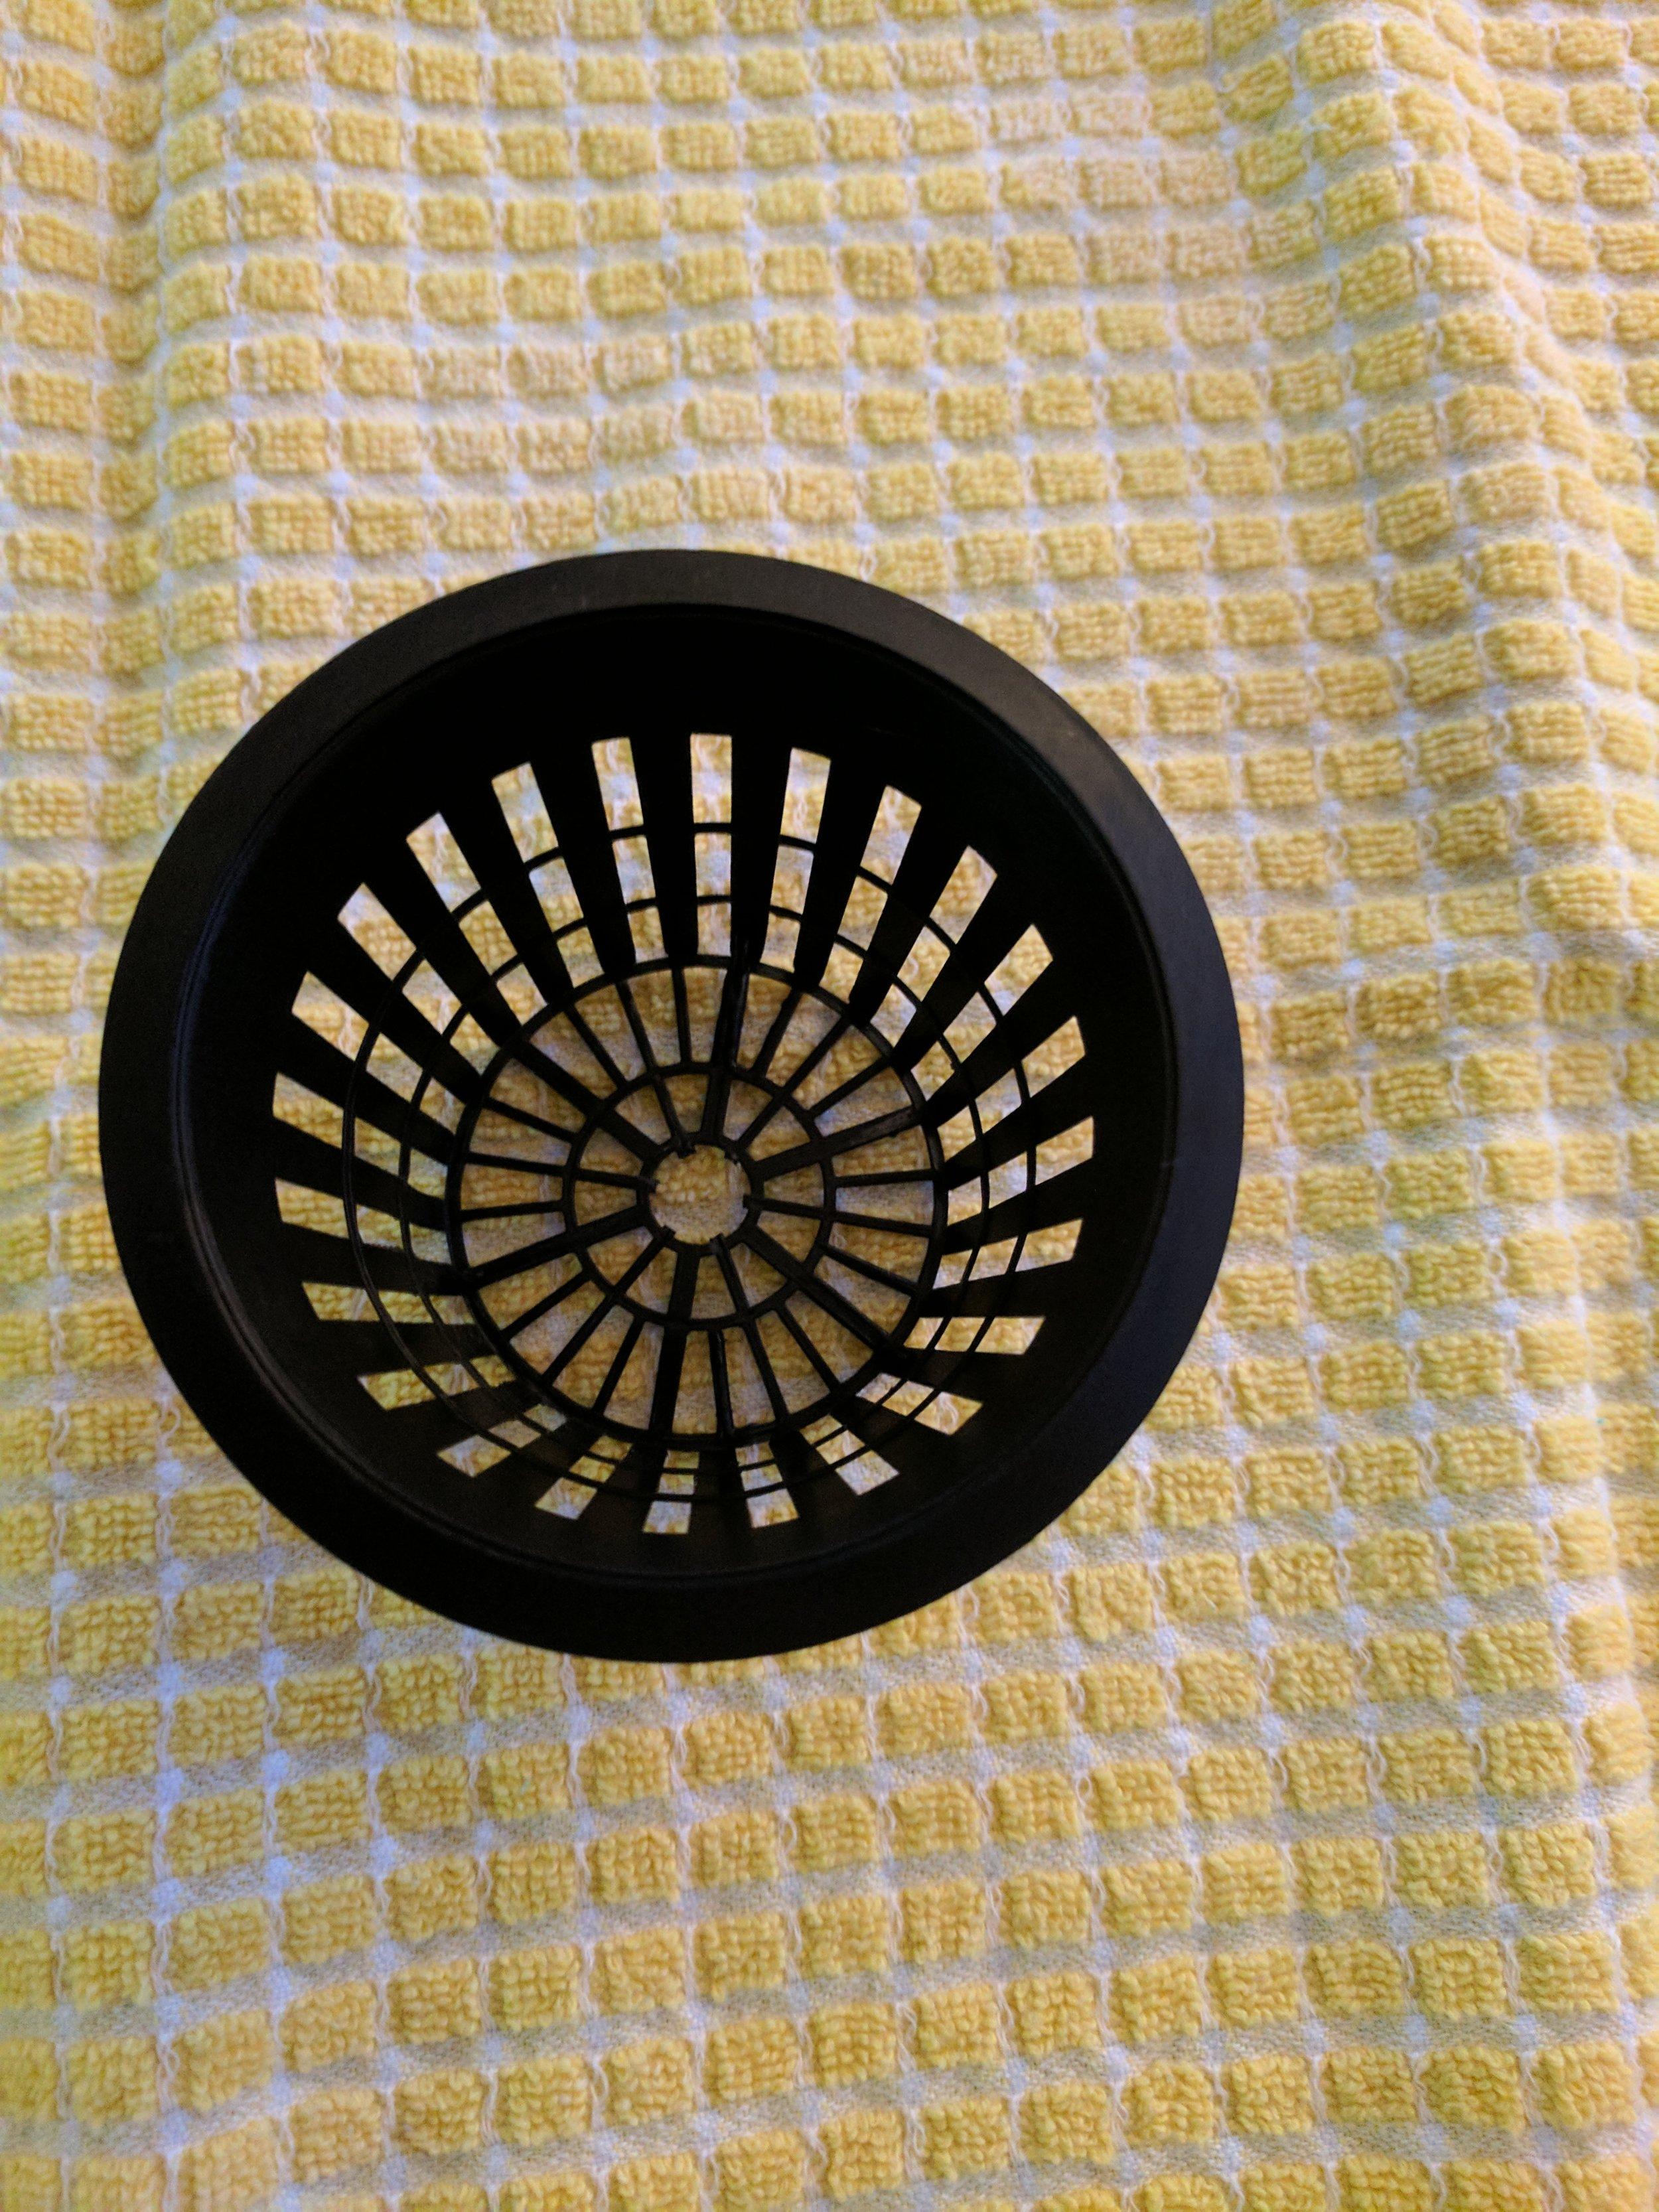 2. Cut a hole in the pot